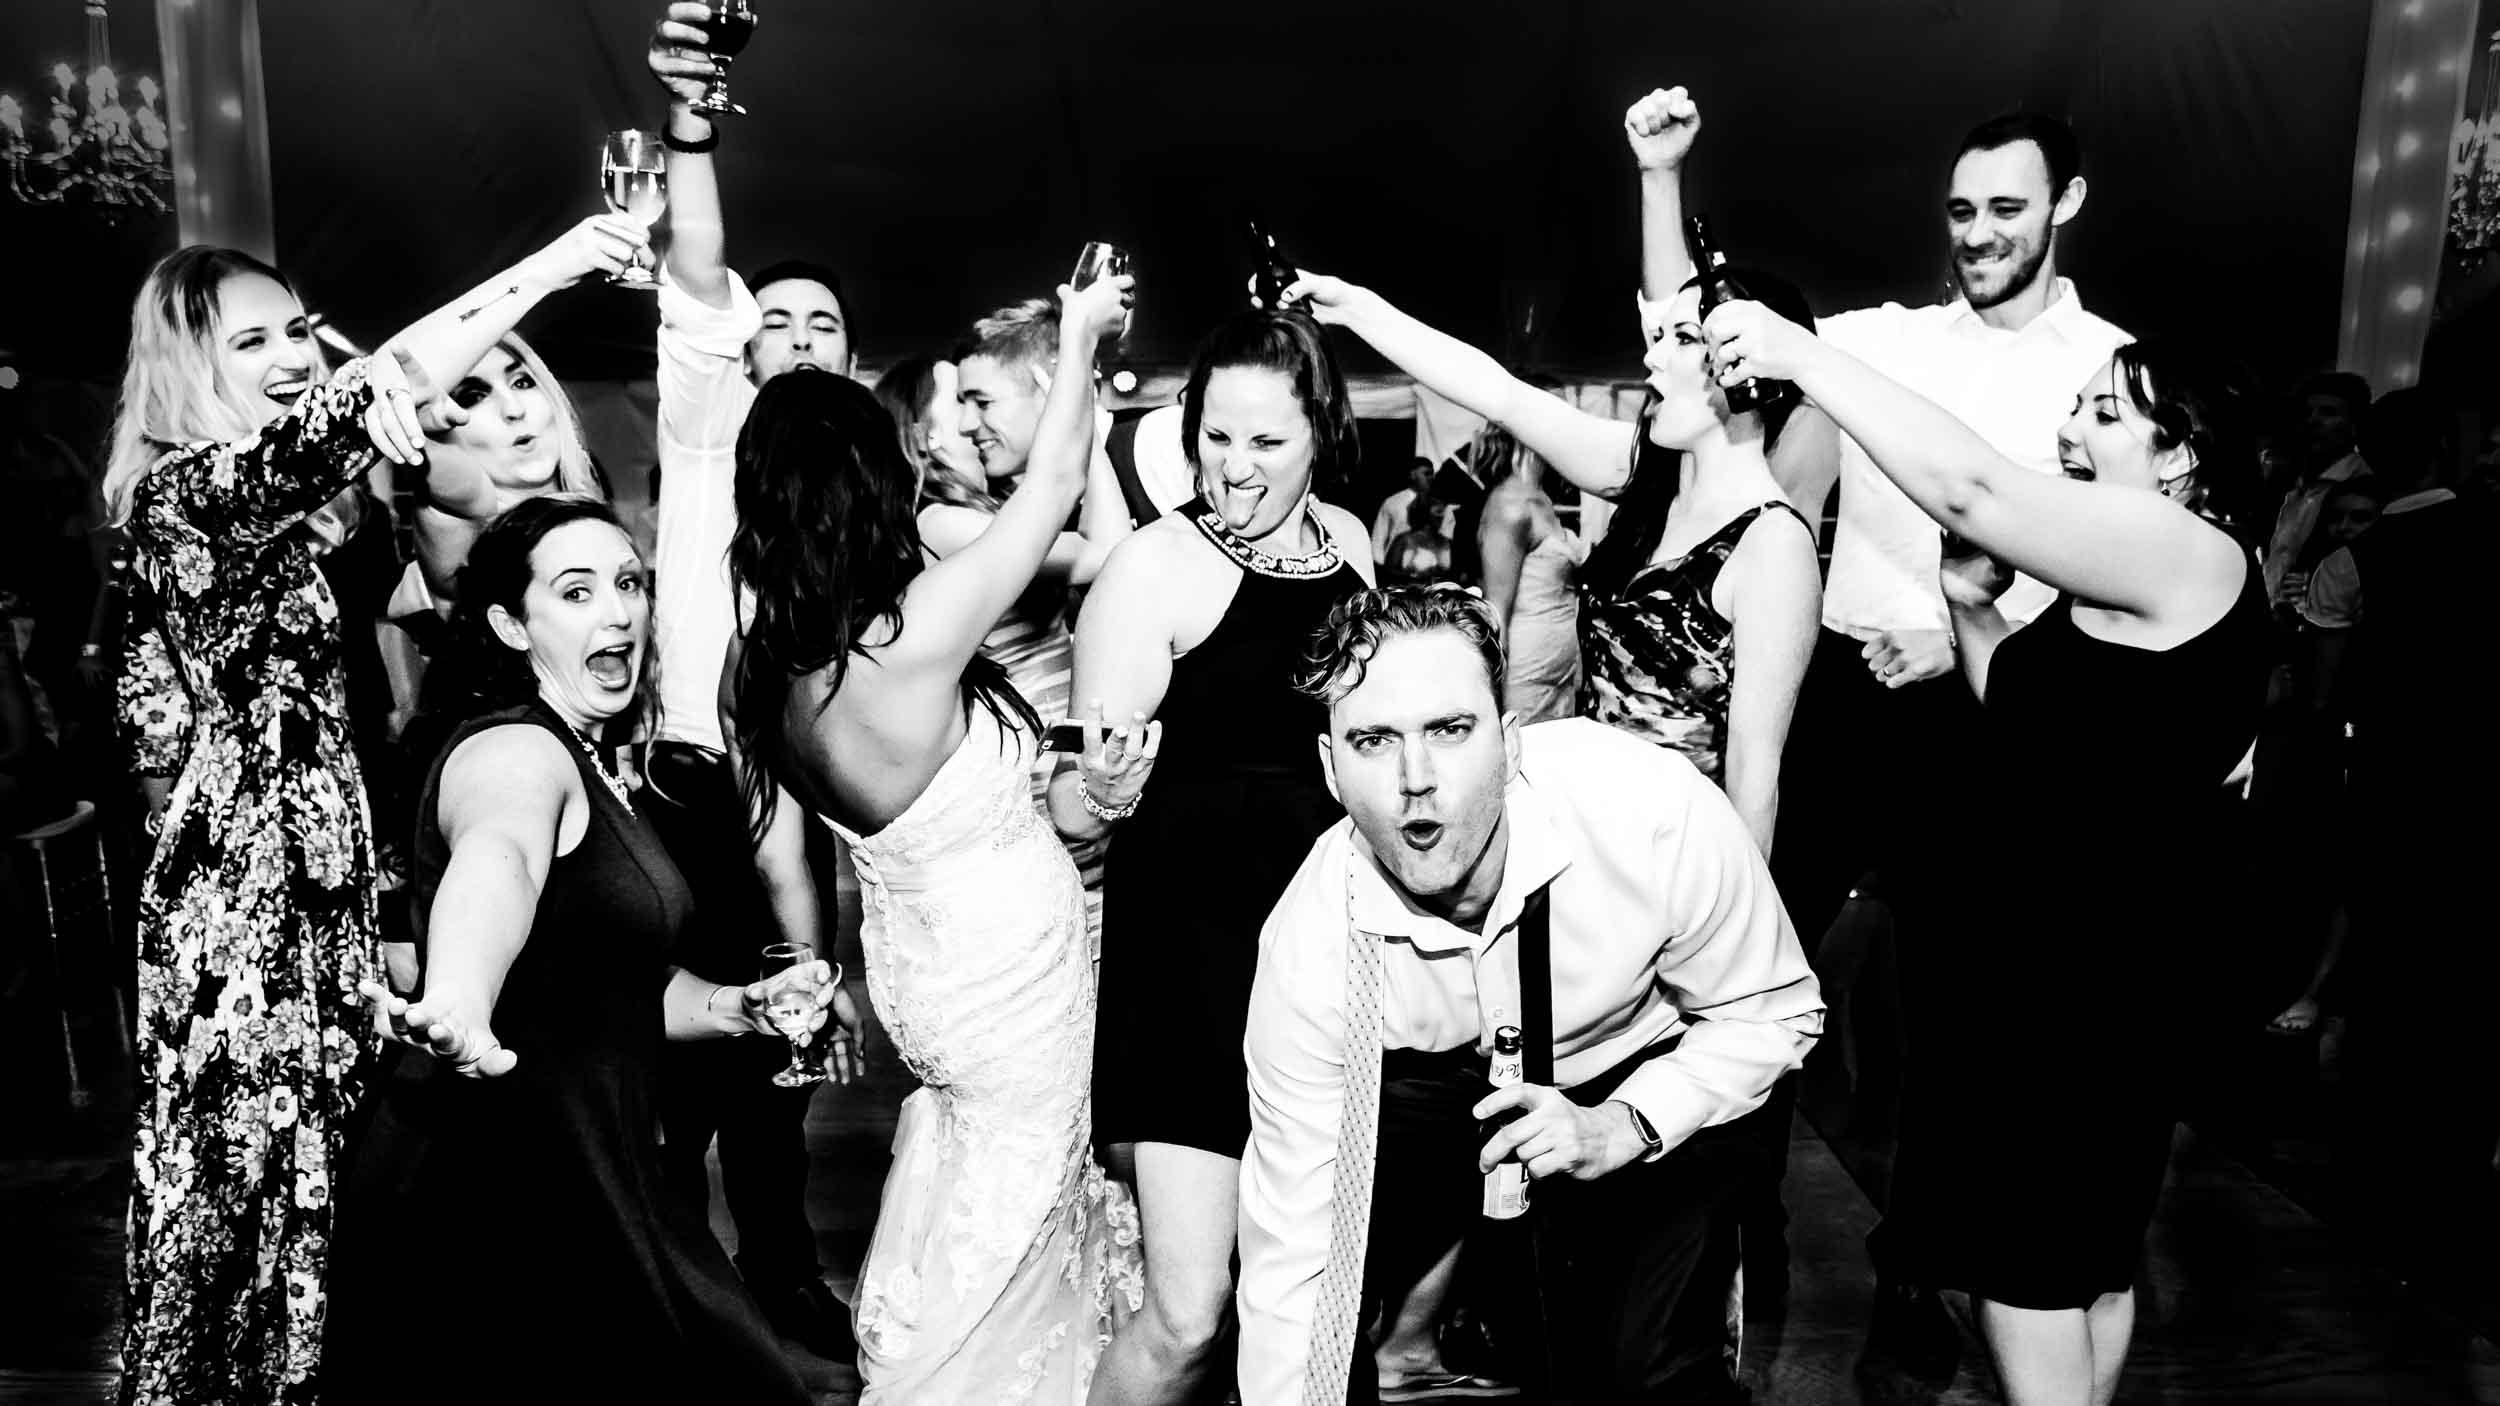 dc+metro+wedding+photographer+vadym+guliuk+photography+wedding+reception-2029.jpg